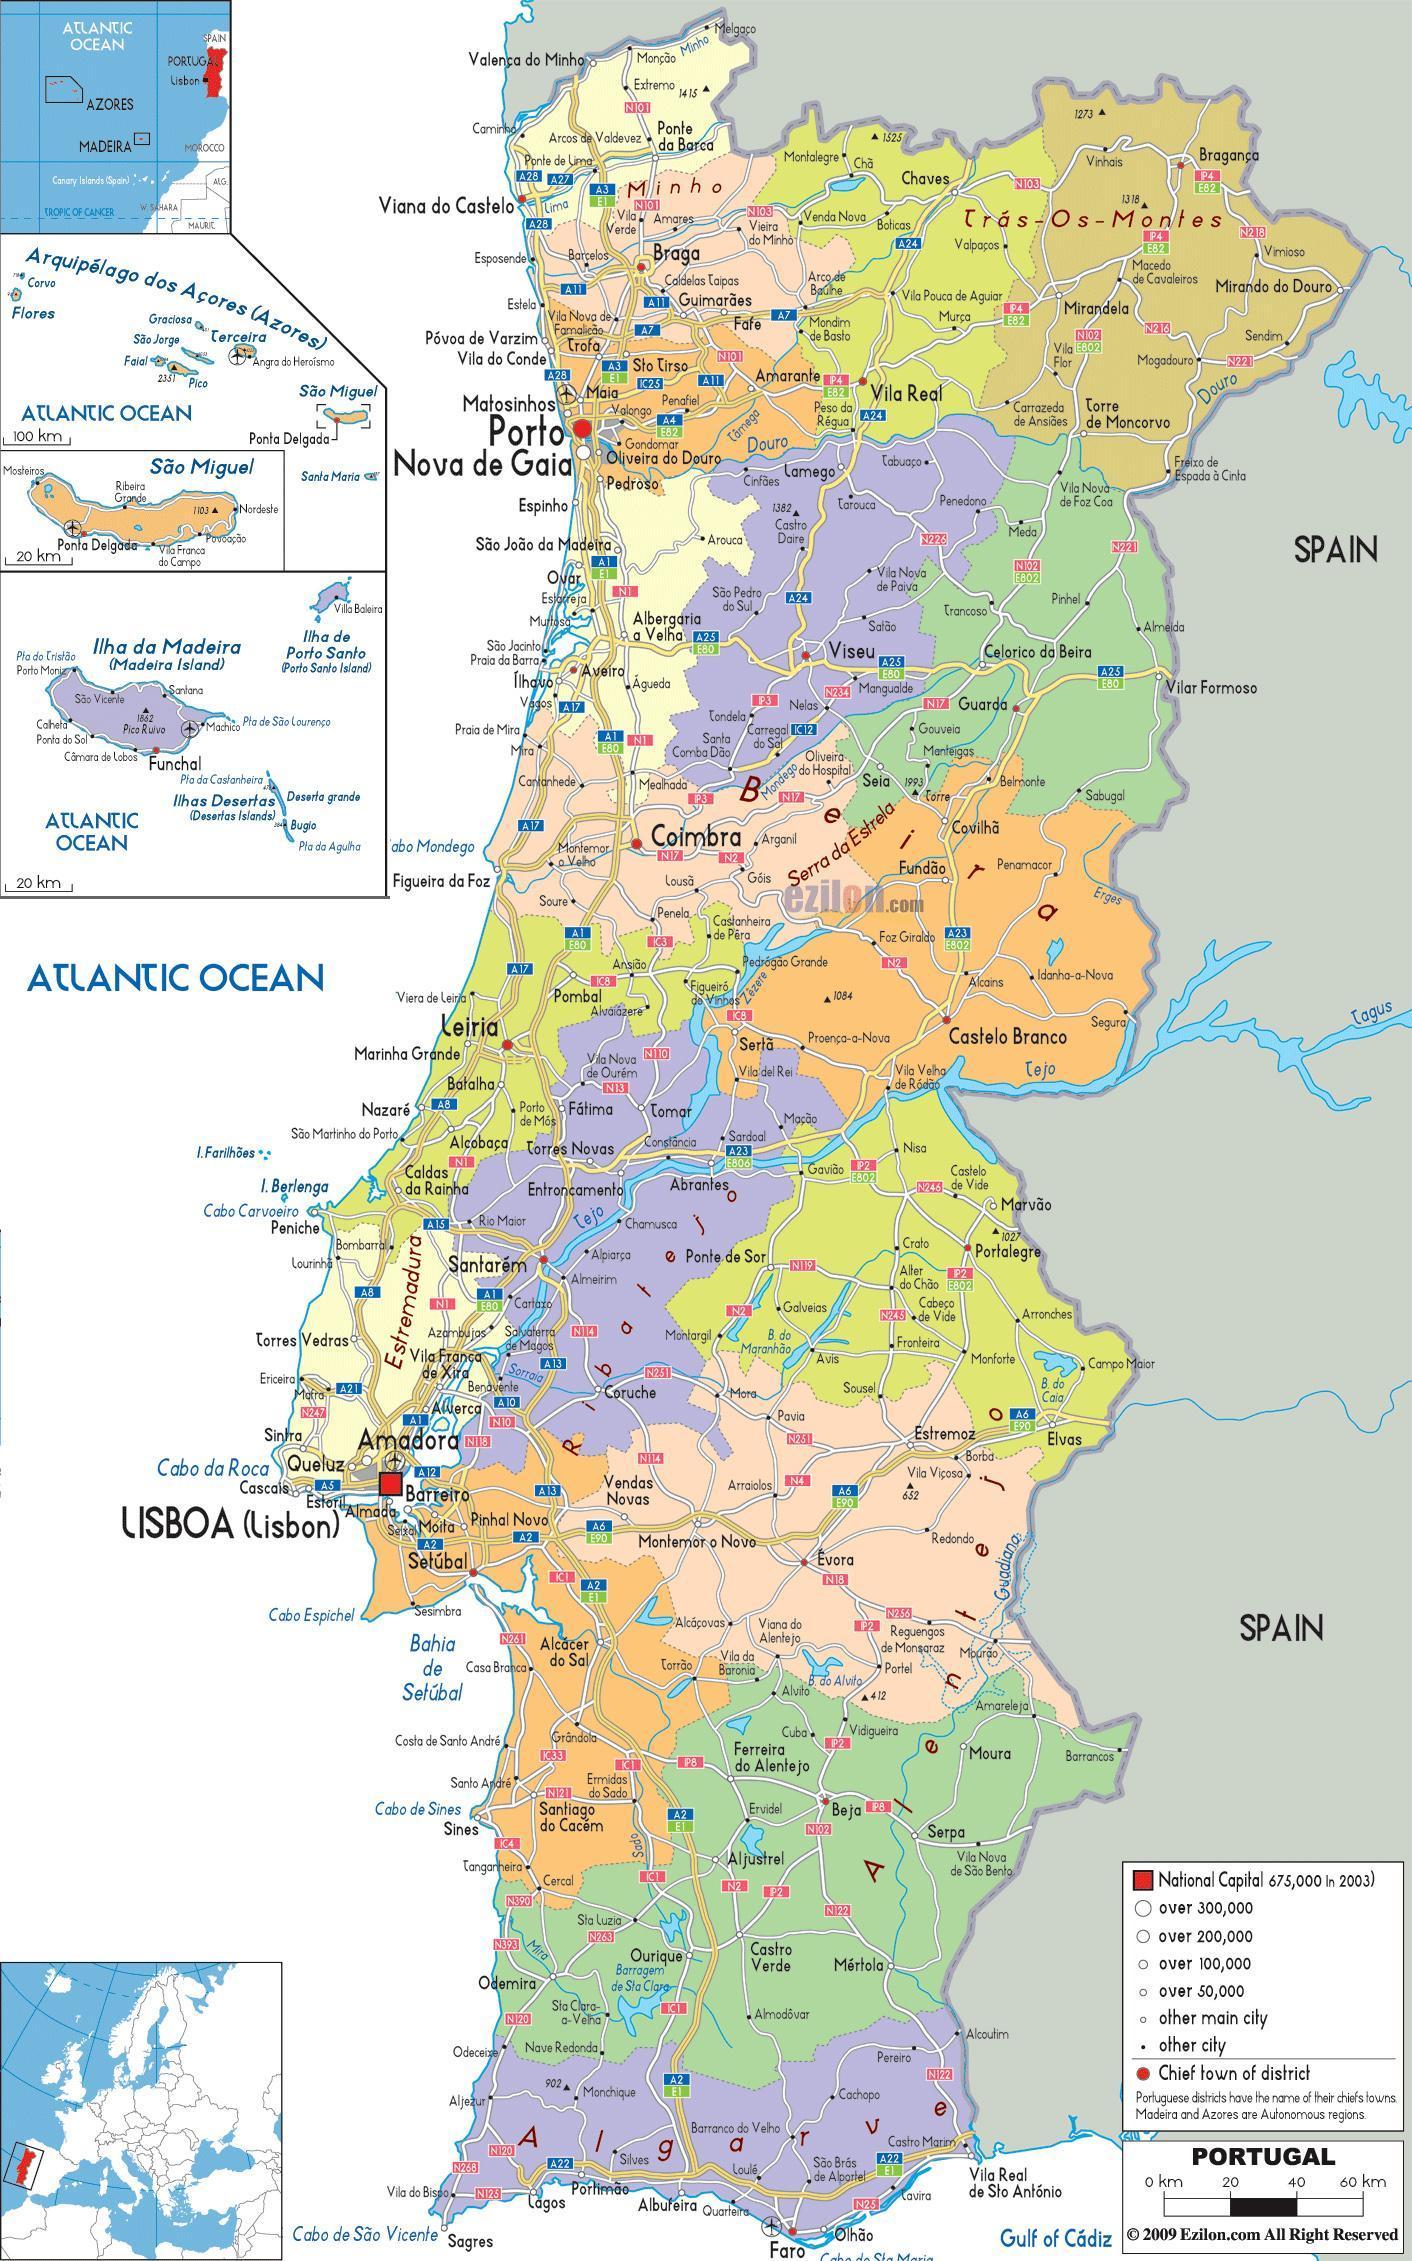 portugália térkép Portugália térkép városok   Térkép Portugália a városok (Dél